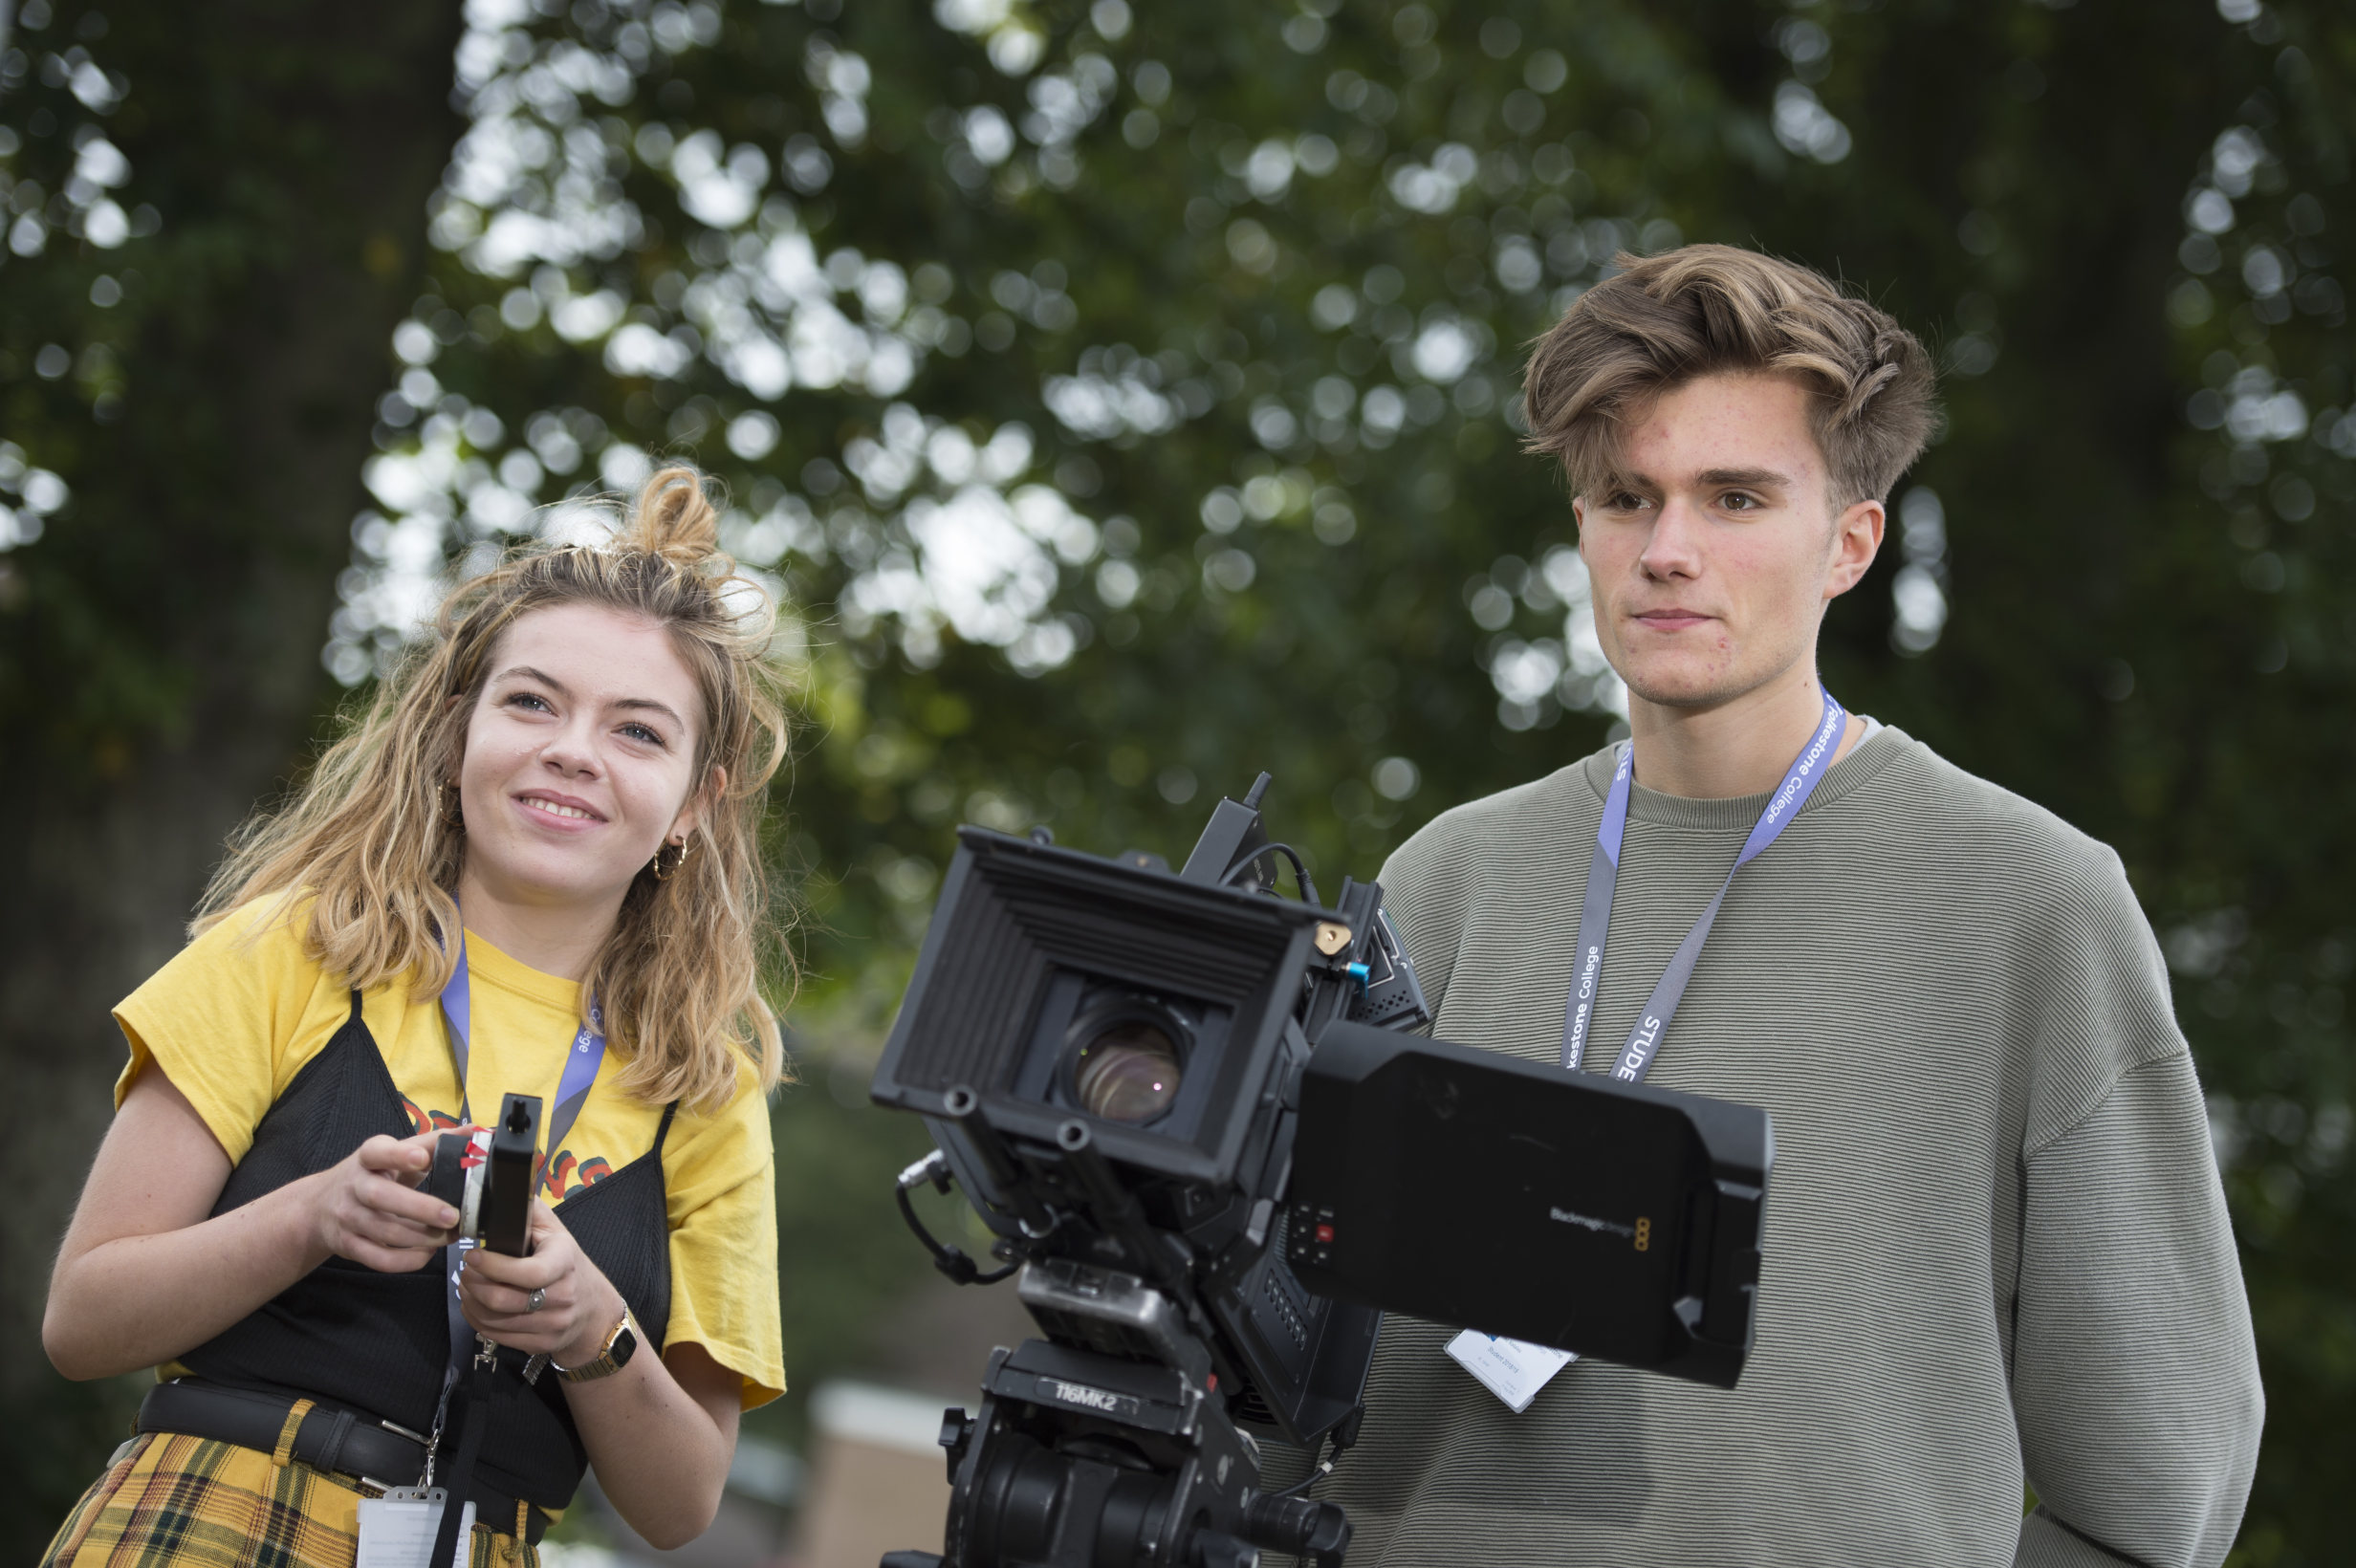 Media Folkestone College